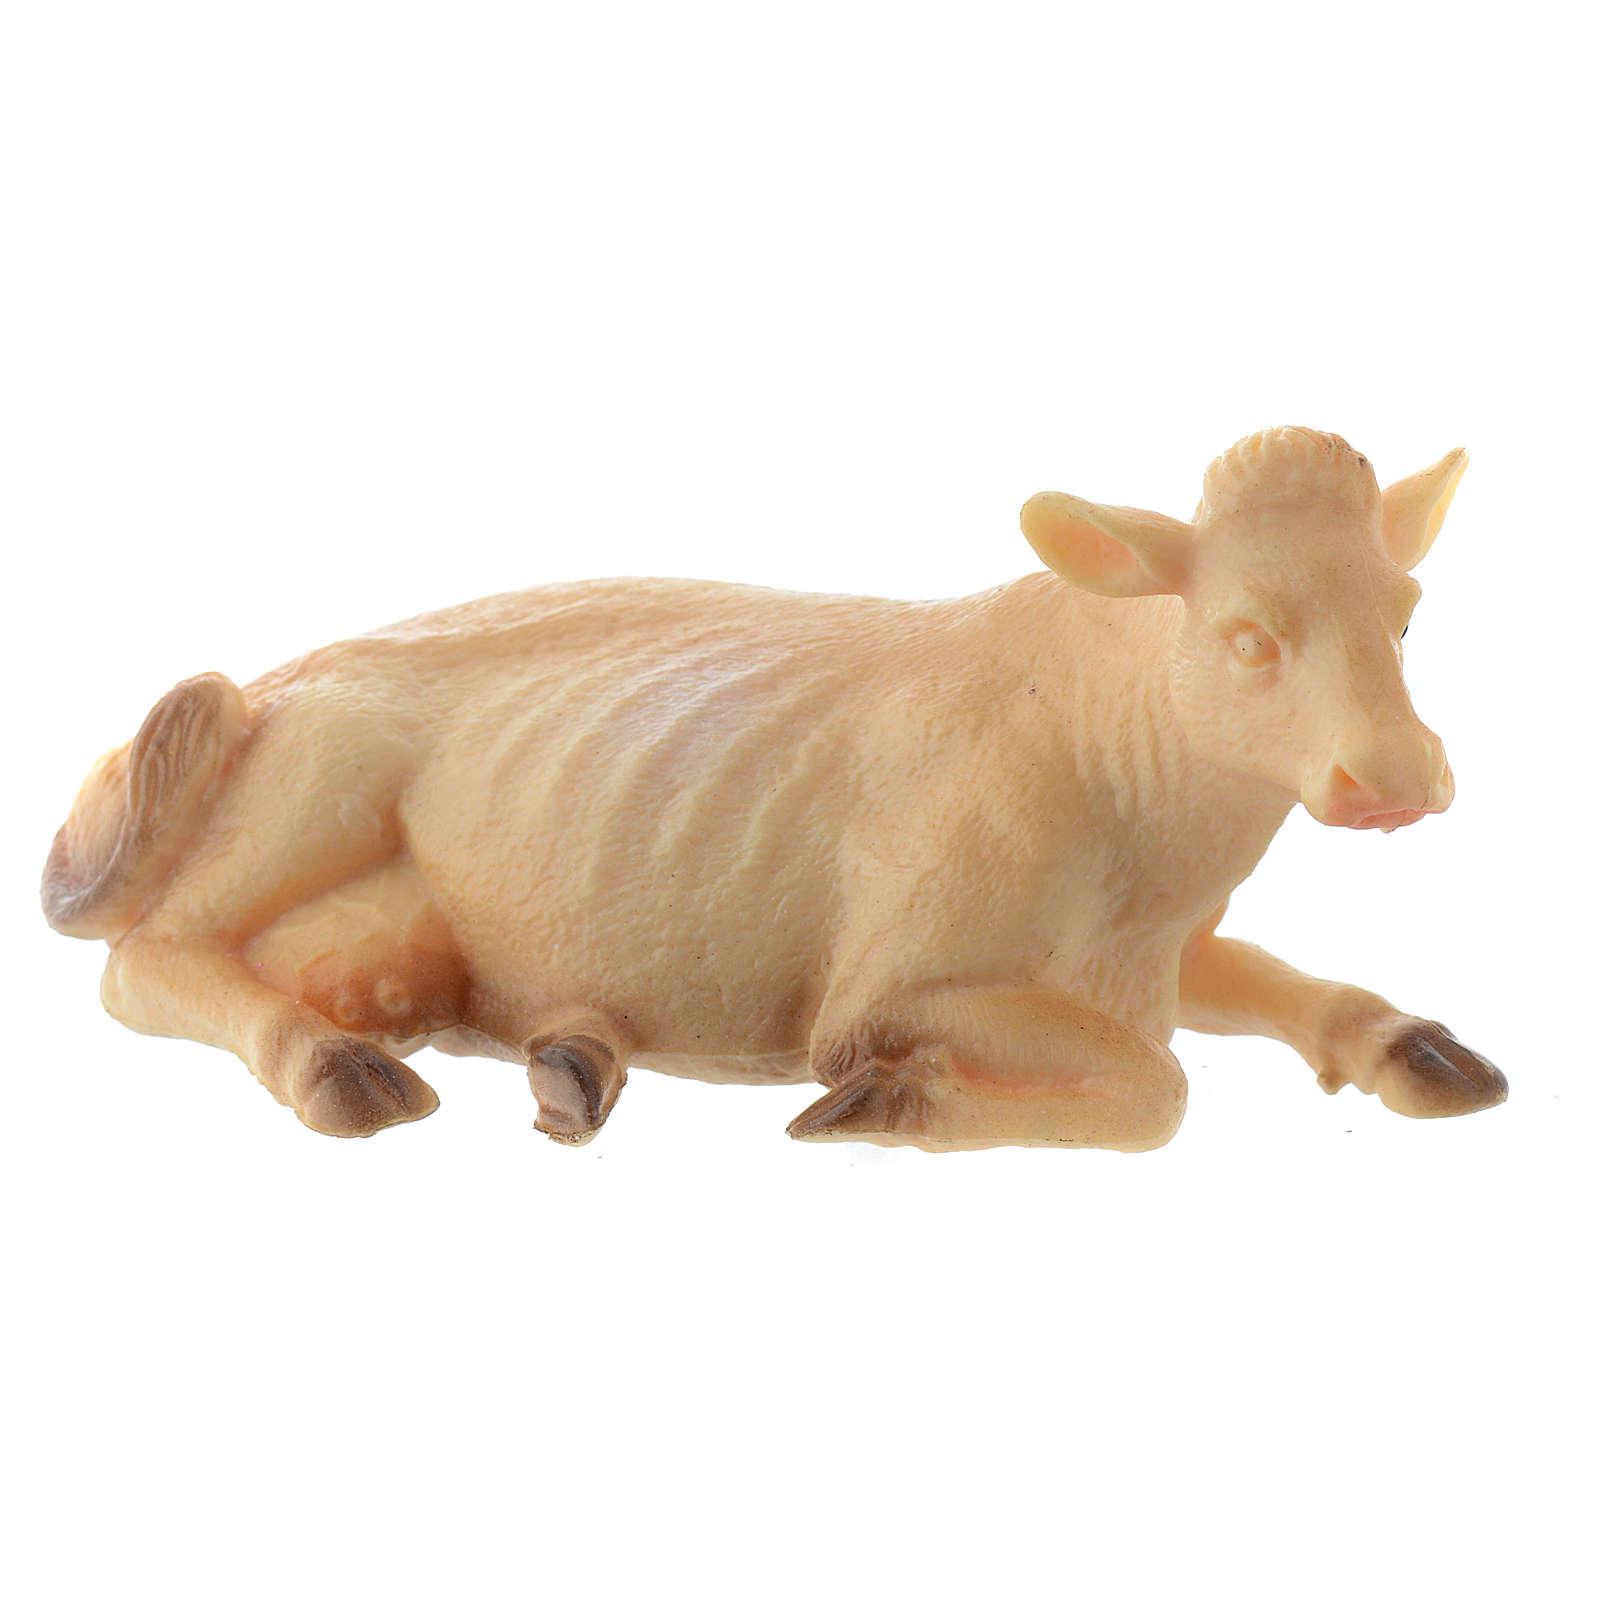 Mucca resina 10 cm 3